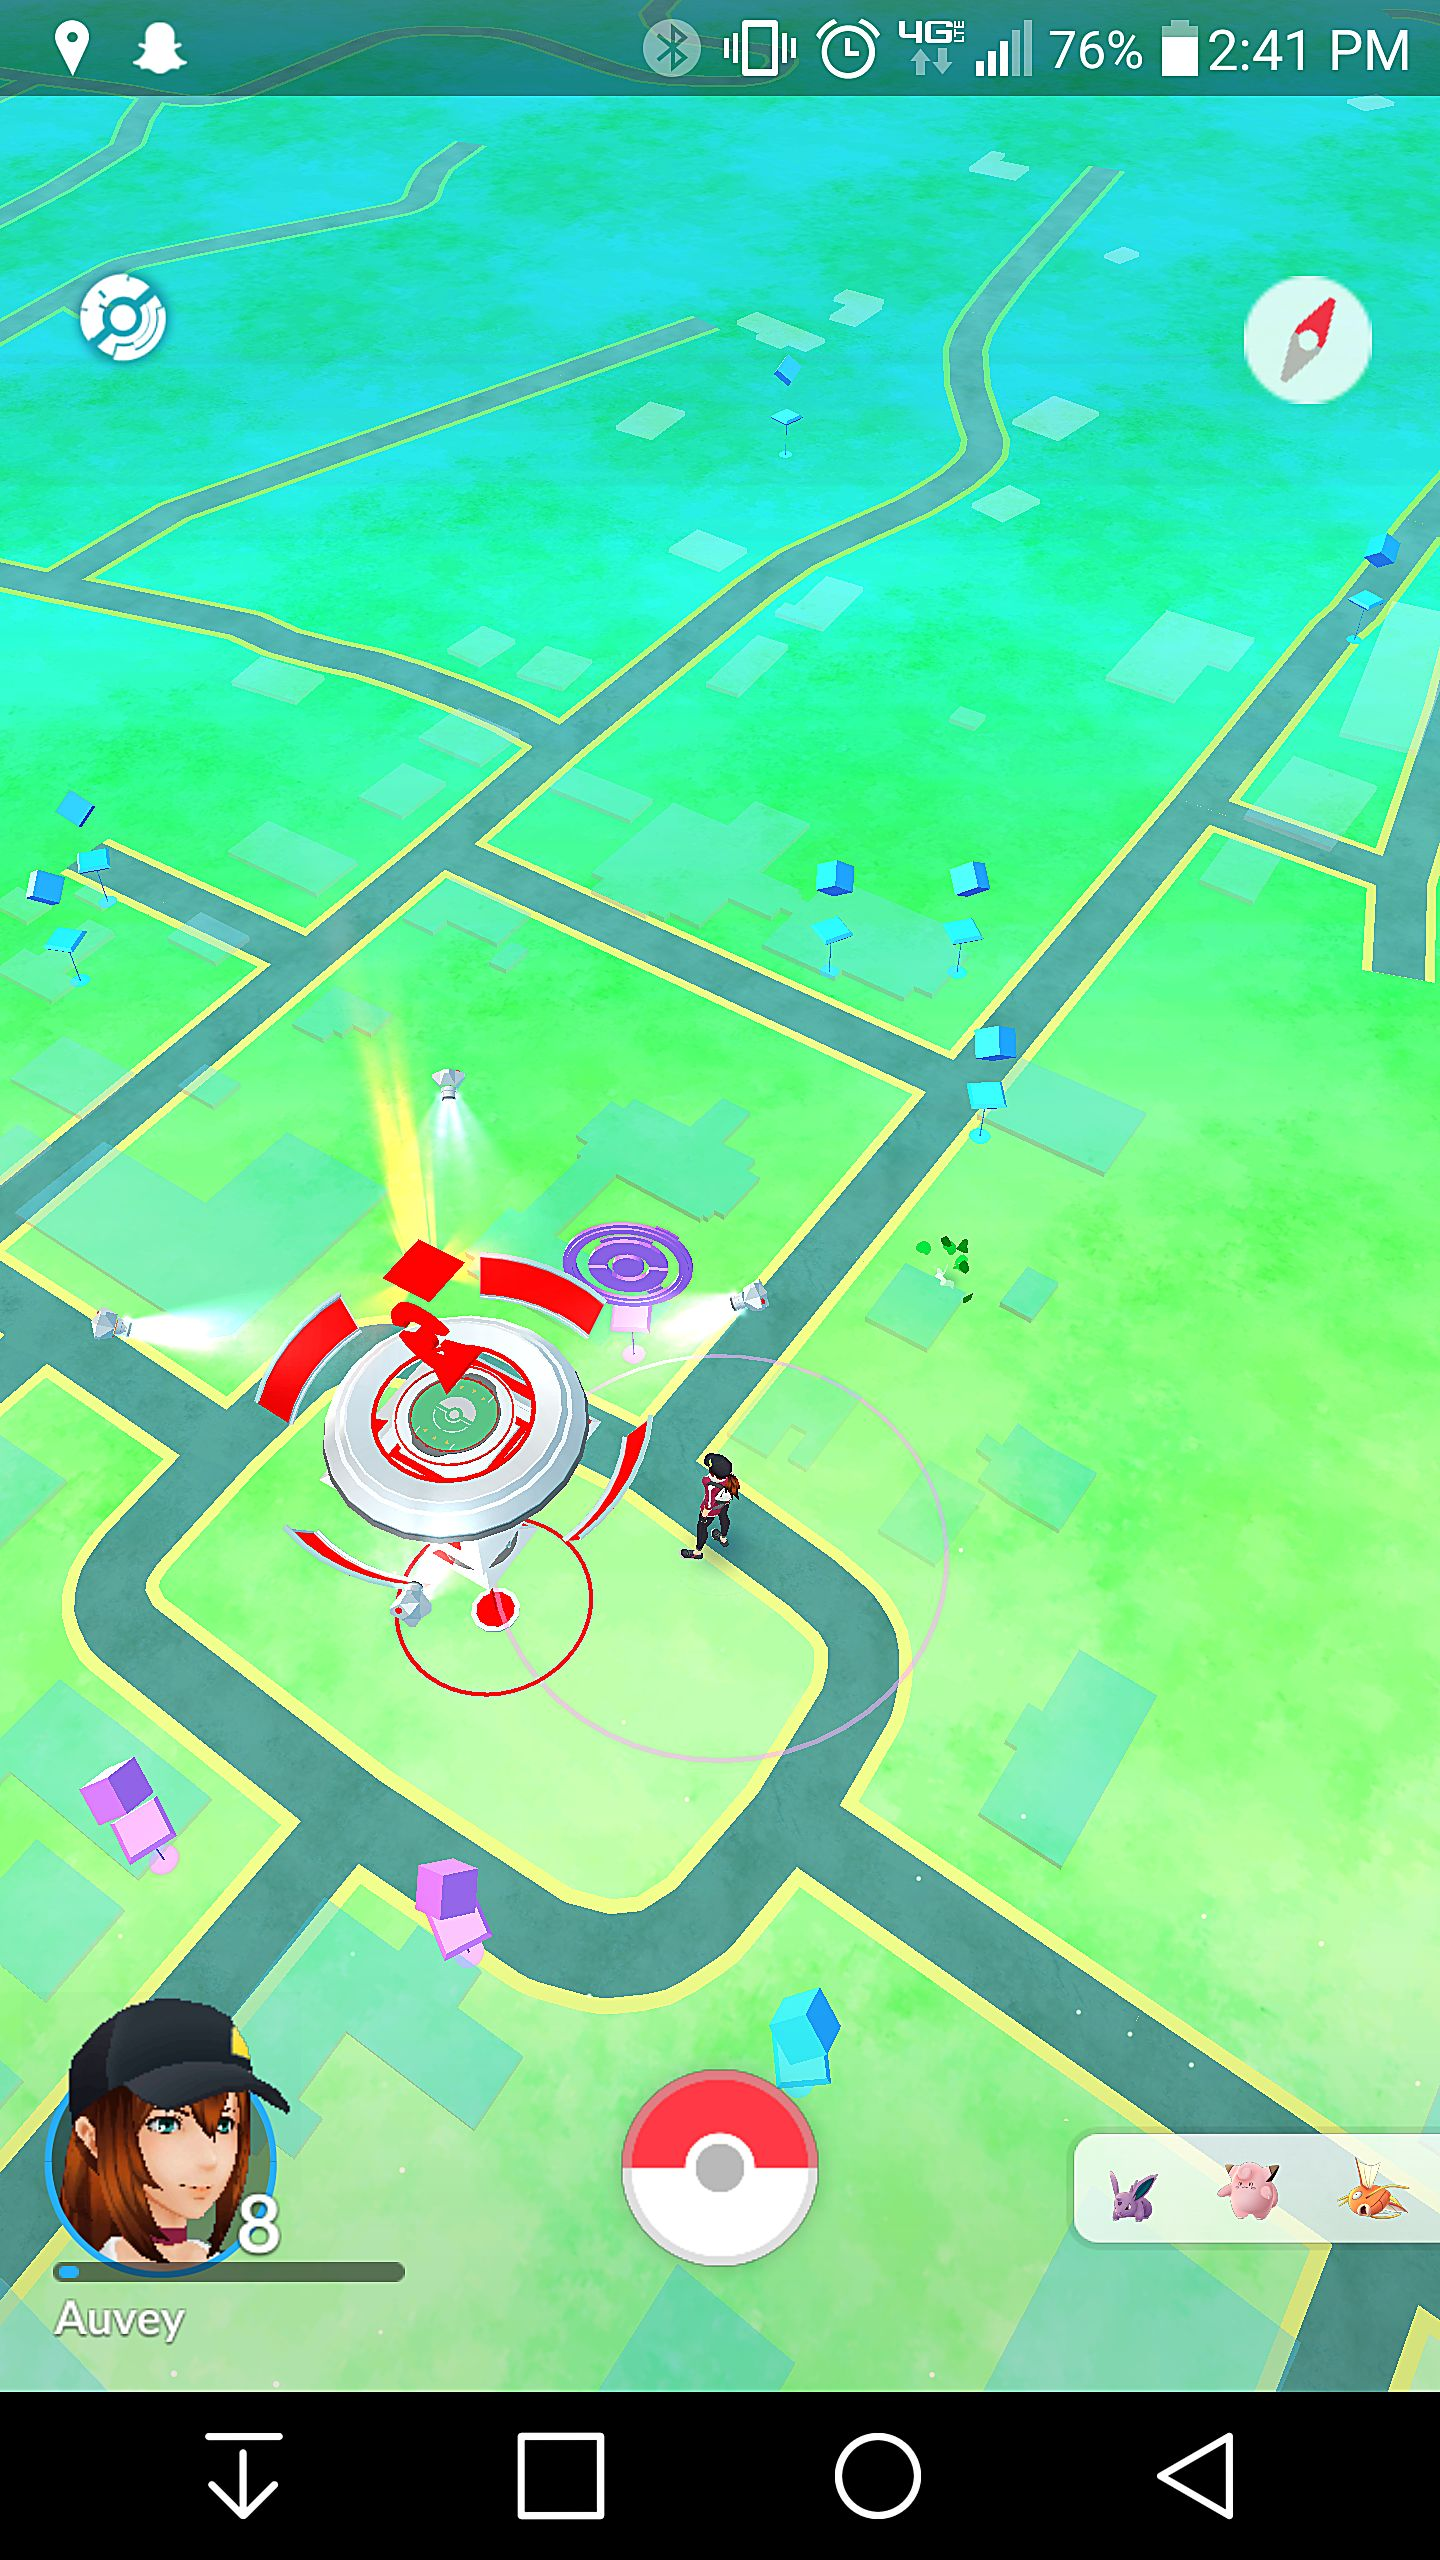 How to Use Ingress to Hunt Pokemon in Pokemon Go